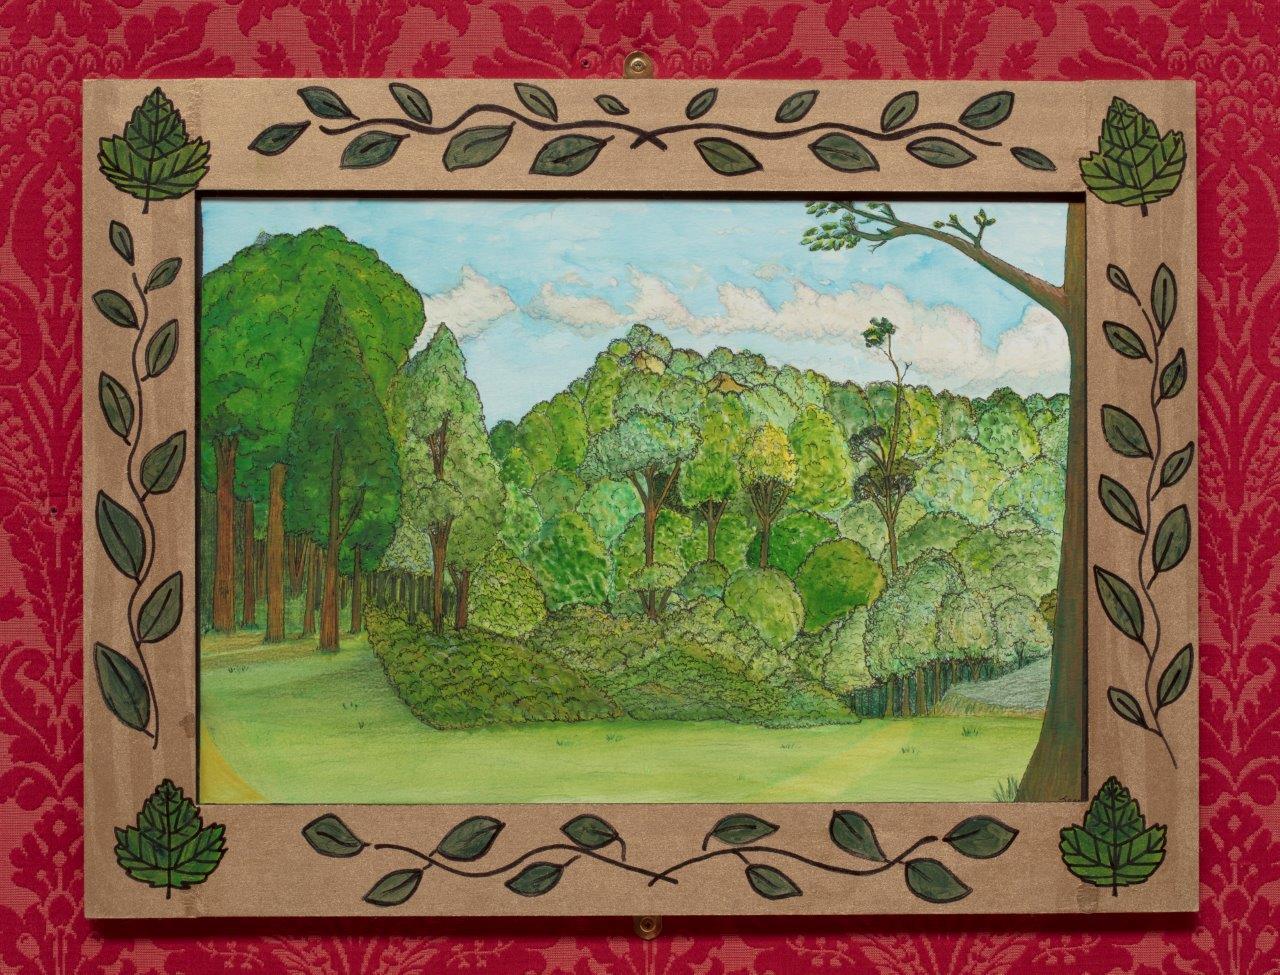 Painting of woodland scene